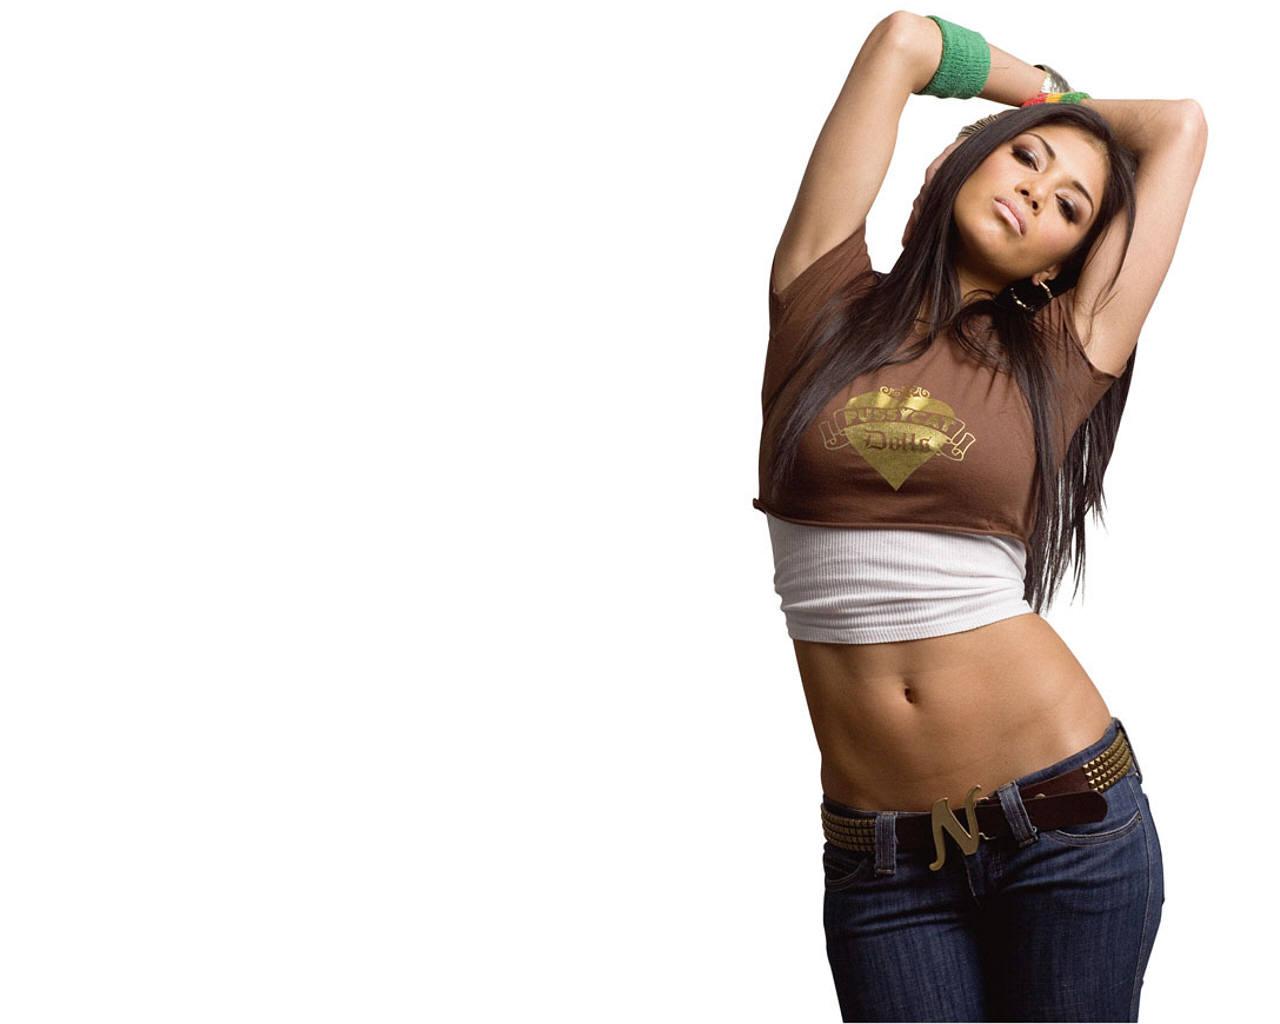 http://3.bp.blogspot.com/_ZN069oJAKVc/TL8UA8sea4I/AAAAAAAAAMs/nEl98ya6W10/s1600/Nicole-Scherzinger-20.jpg